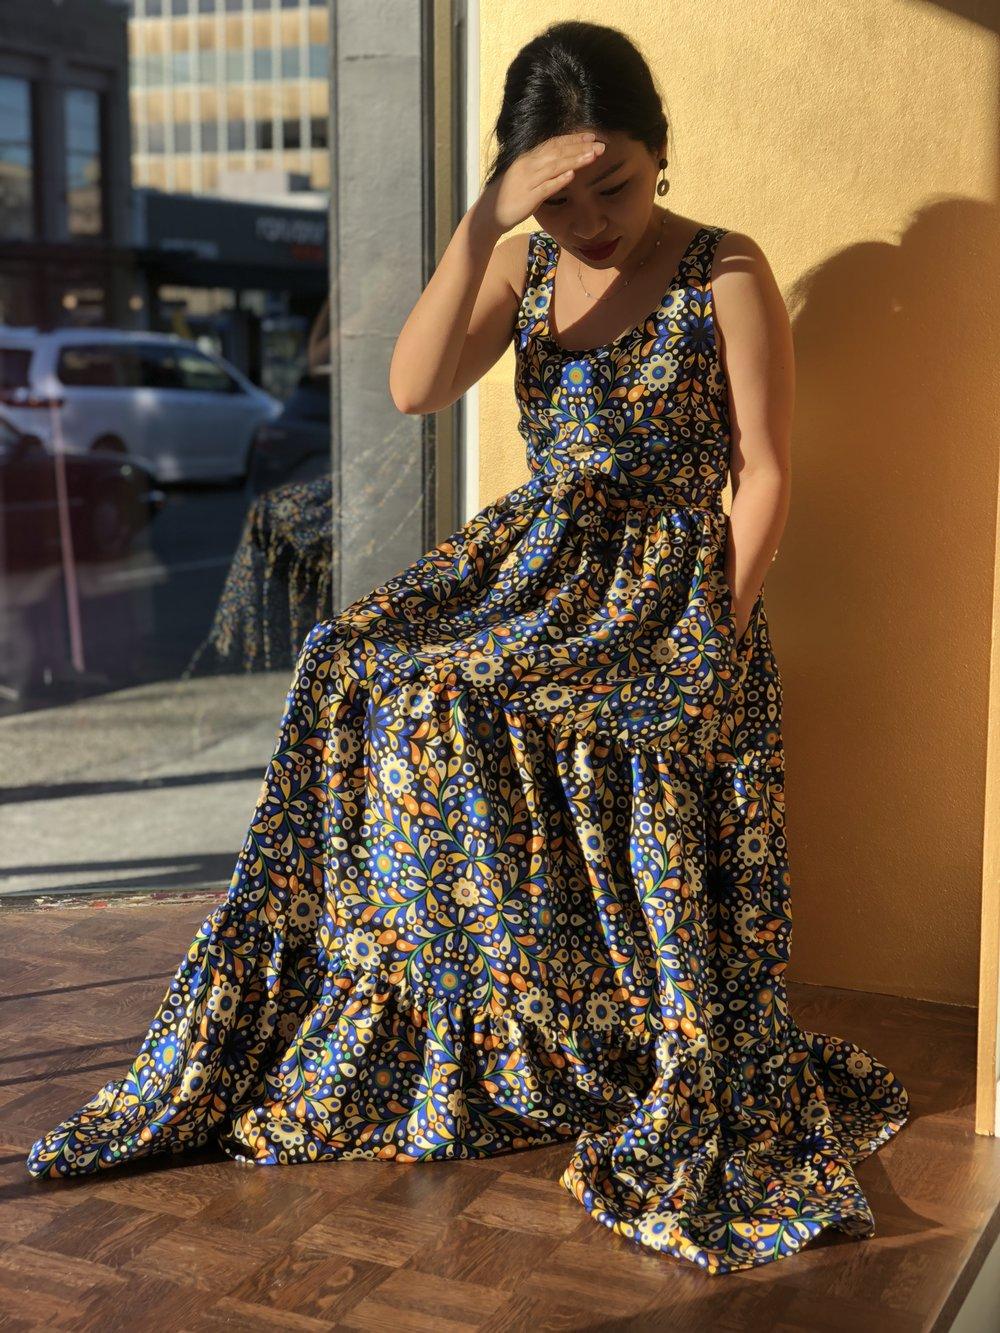 favorite Item #2 - La Double J dress. Sitting pretty . . .